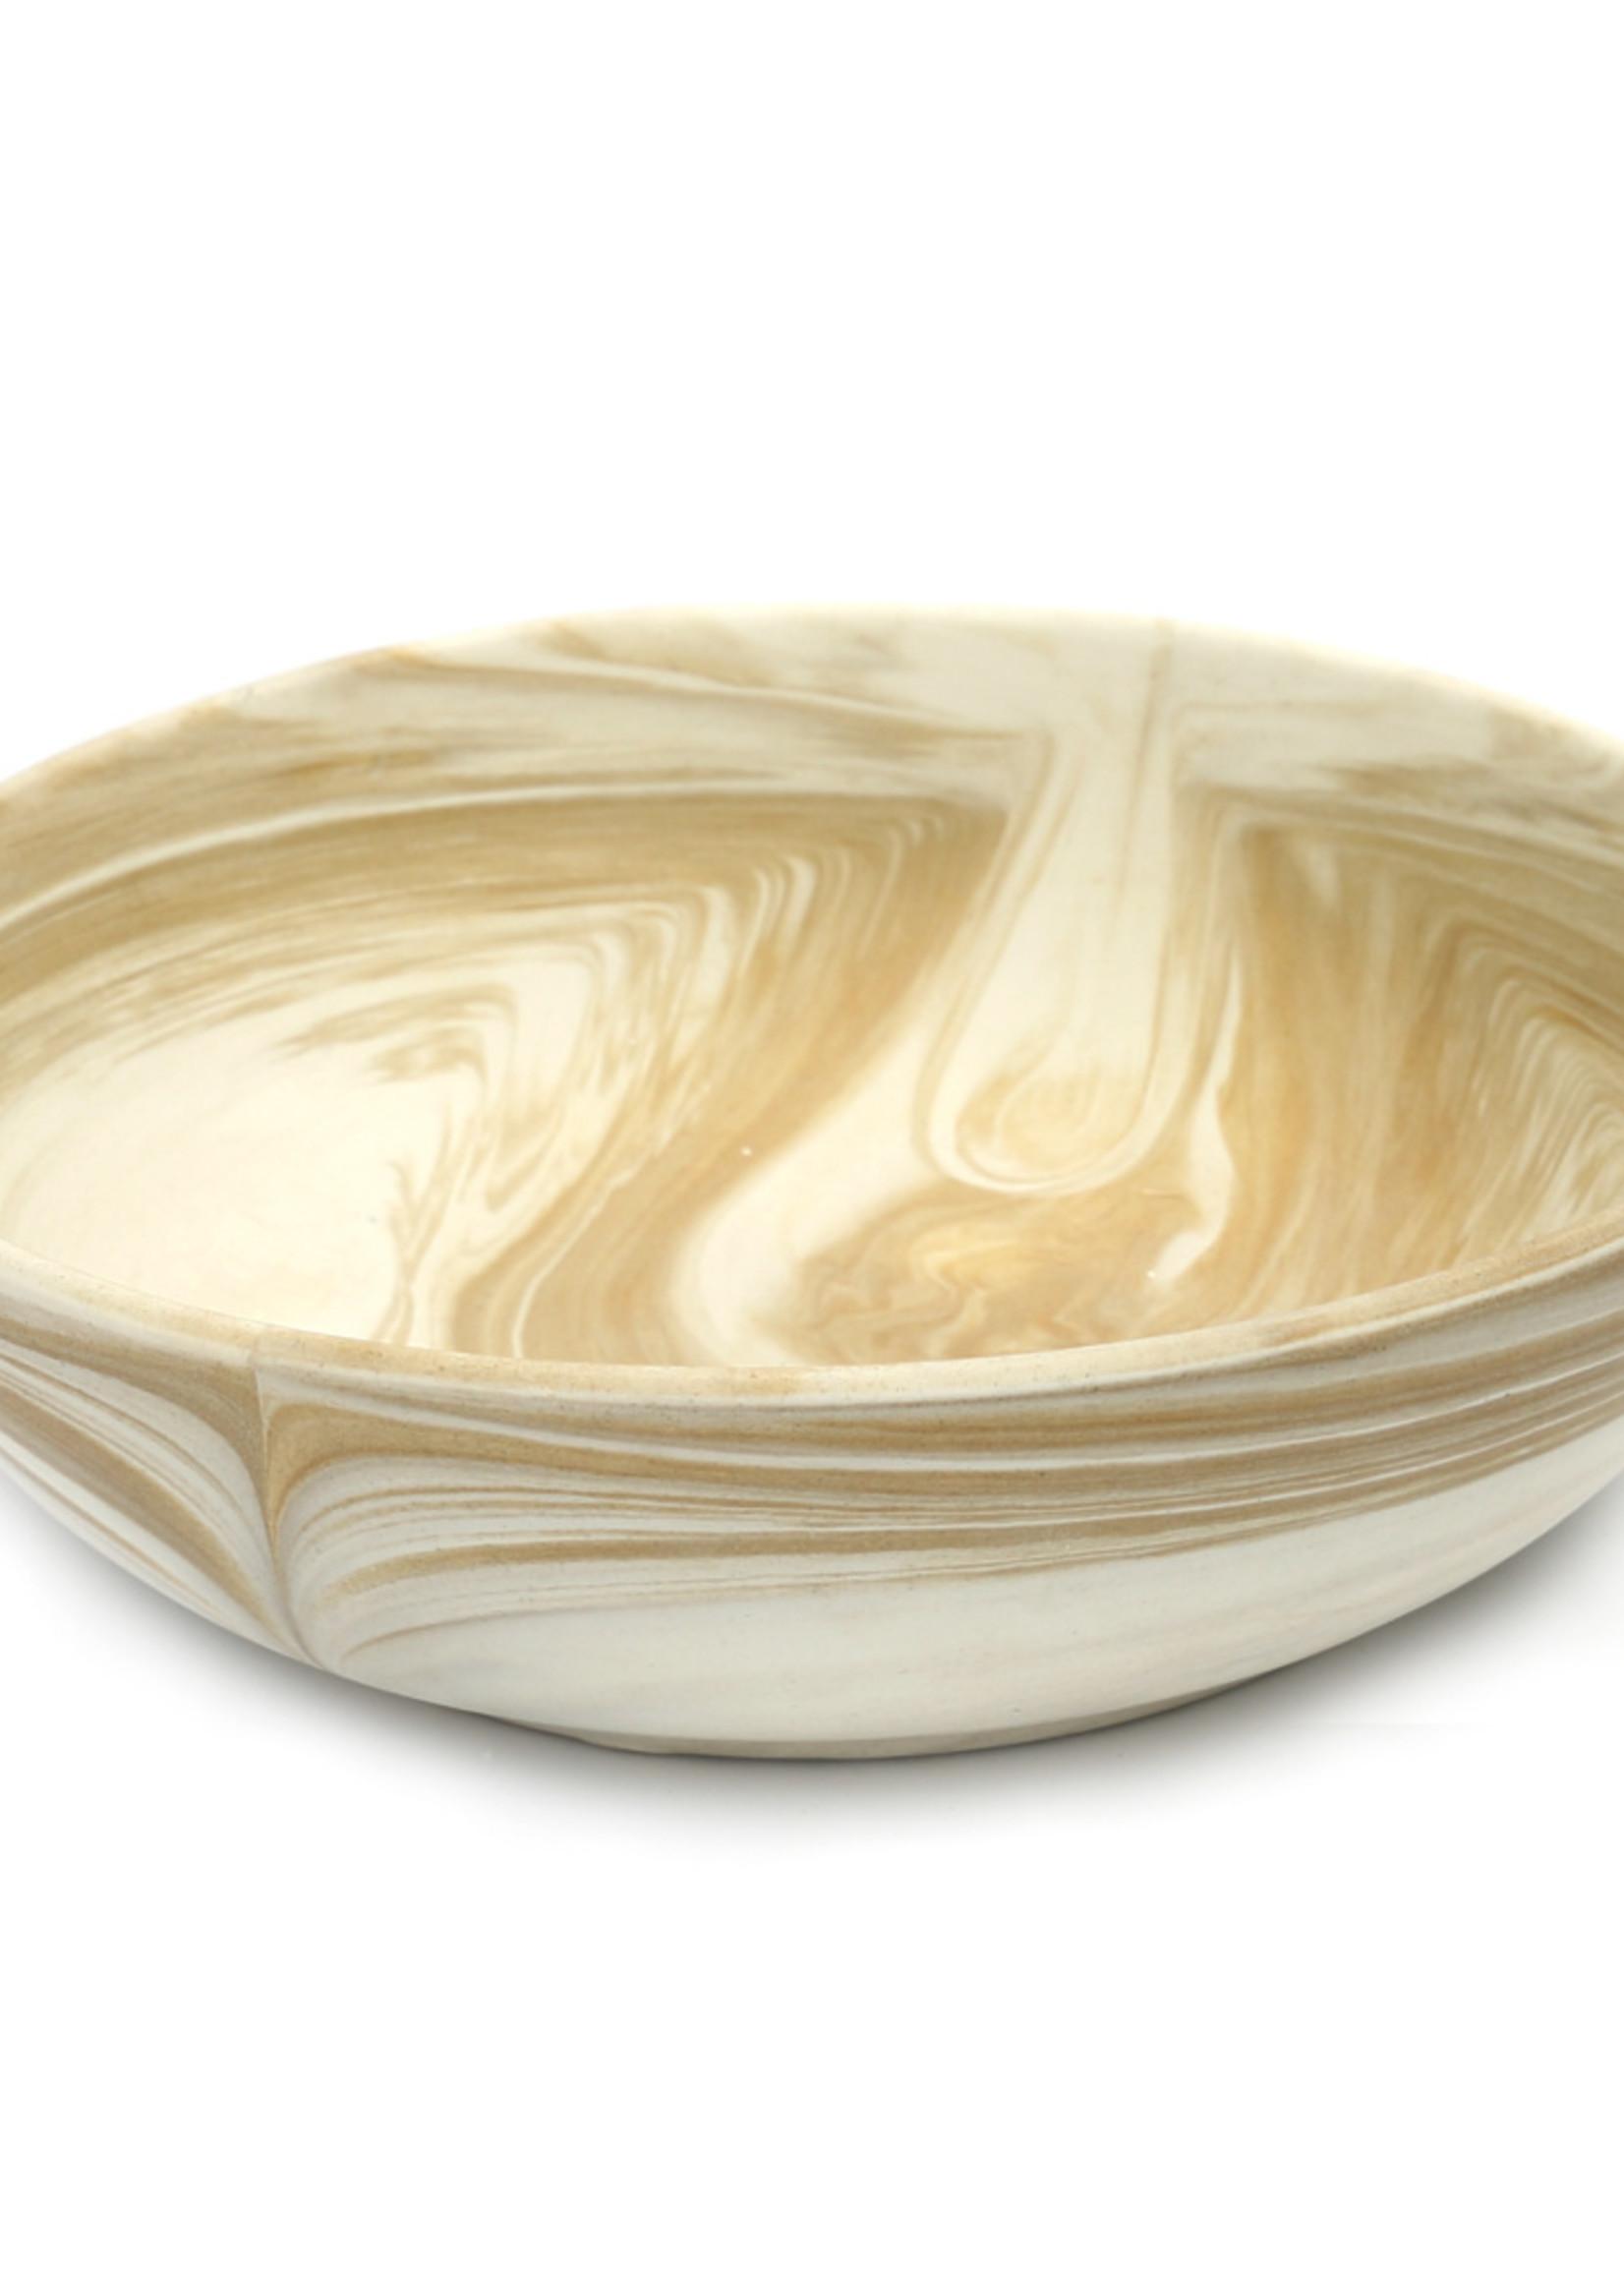 The Ceramic Bowl - Natural White - 23